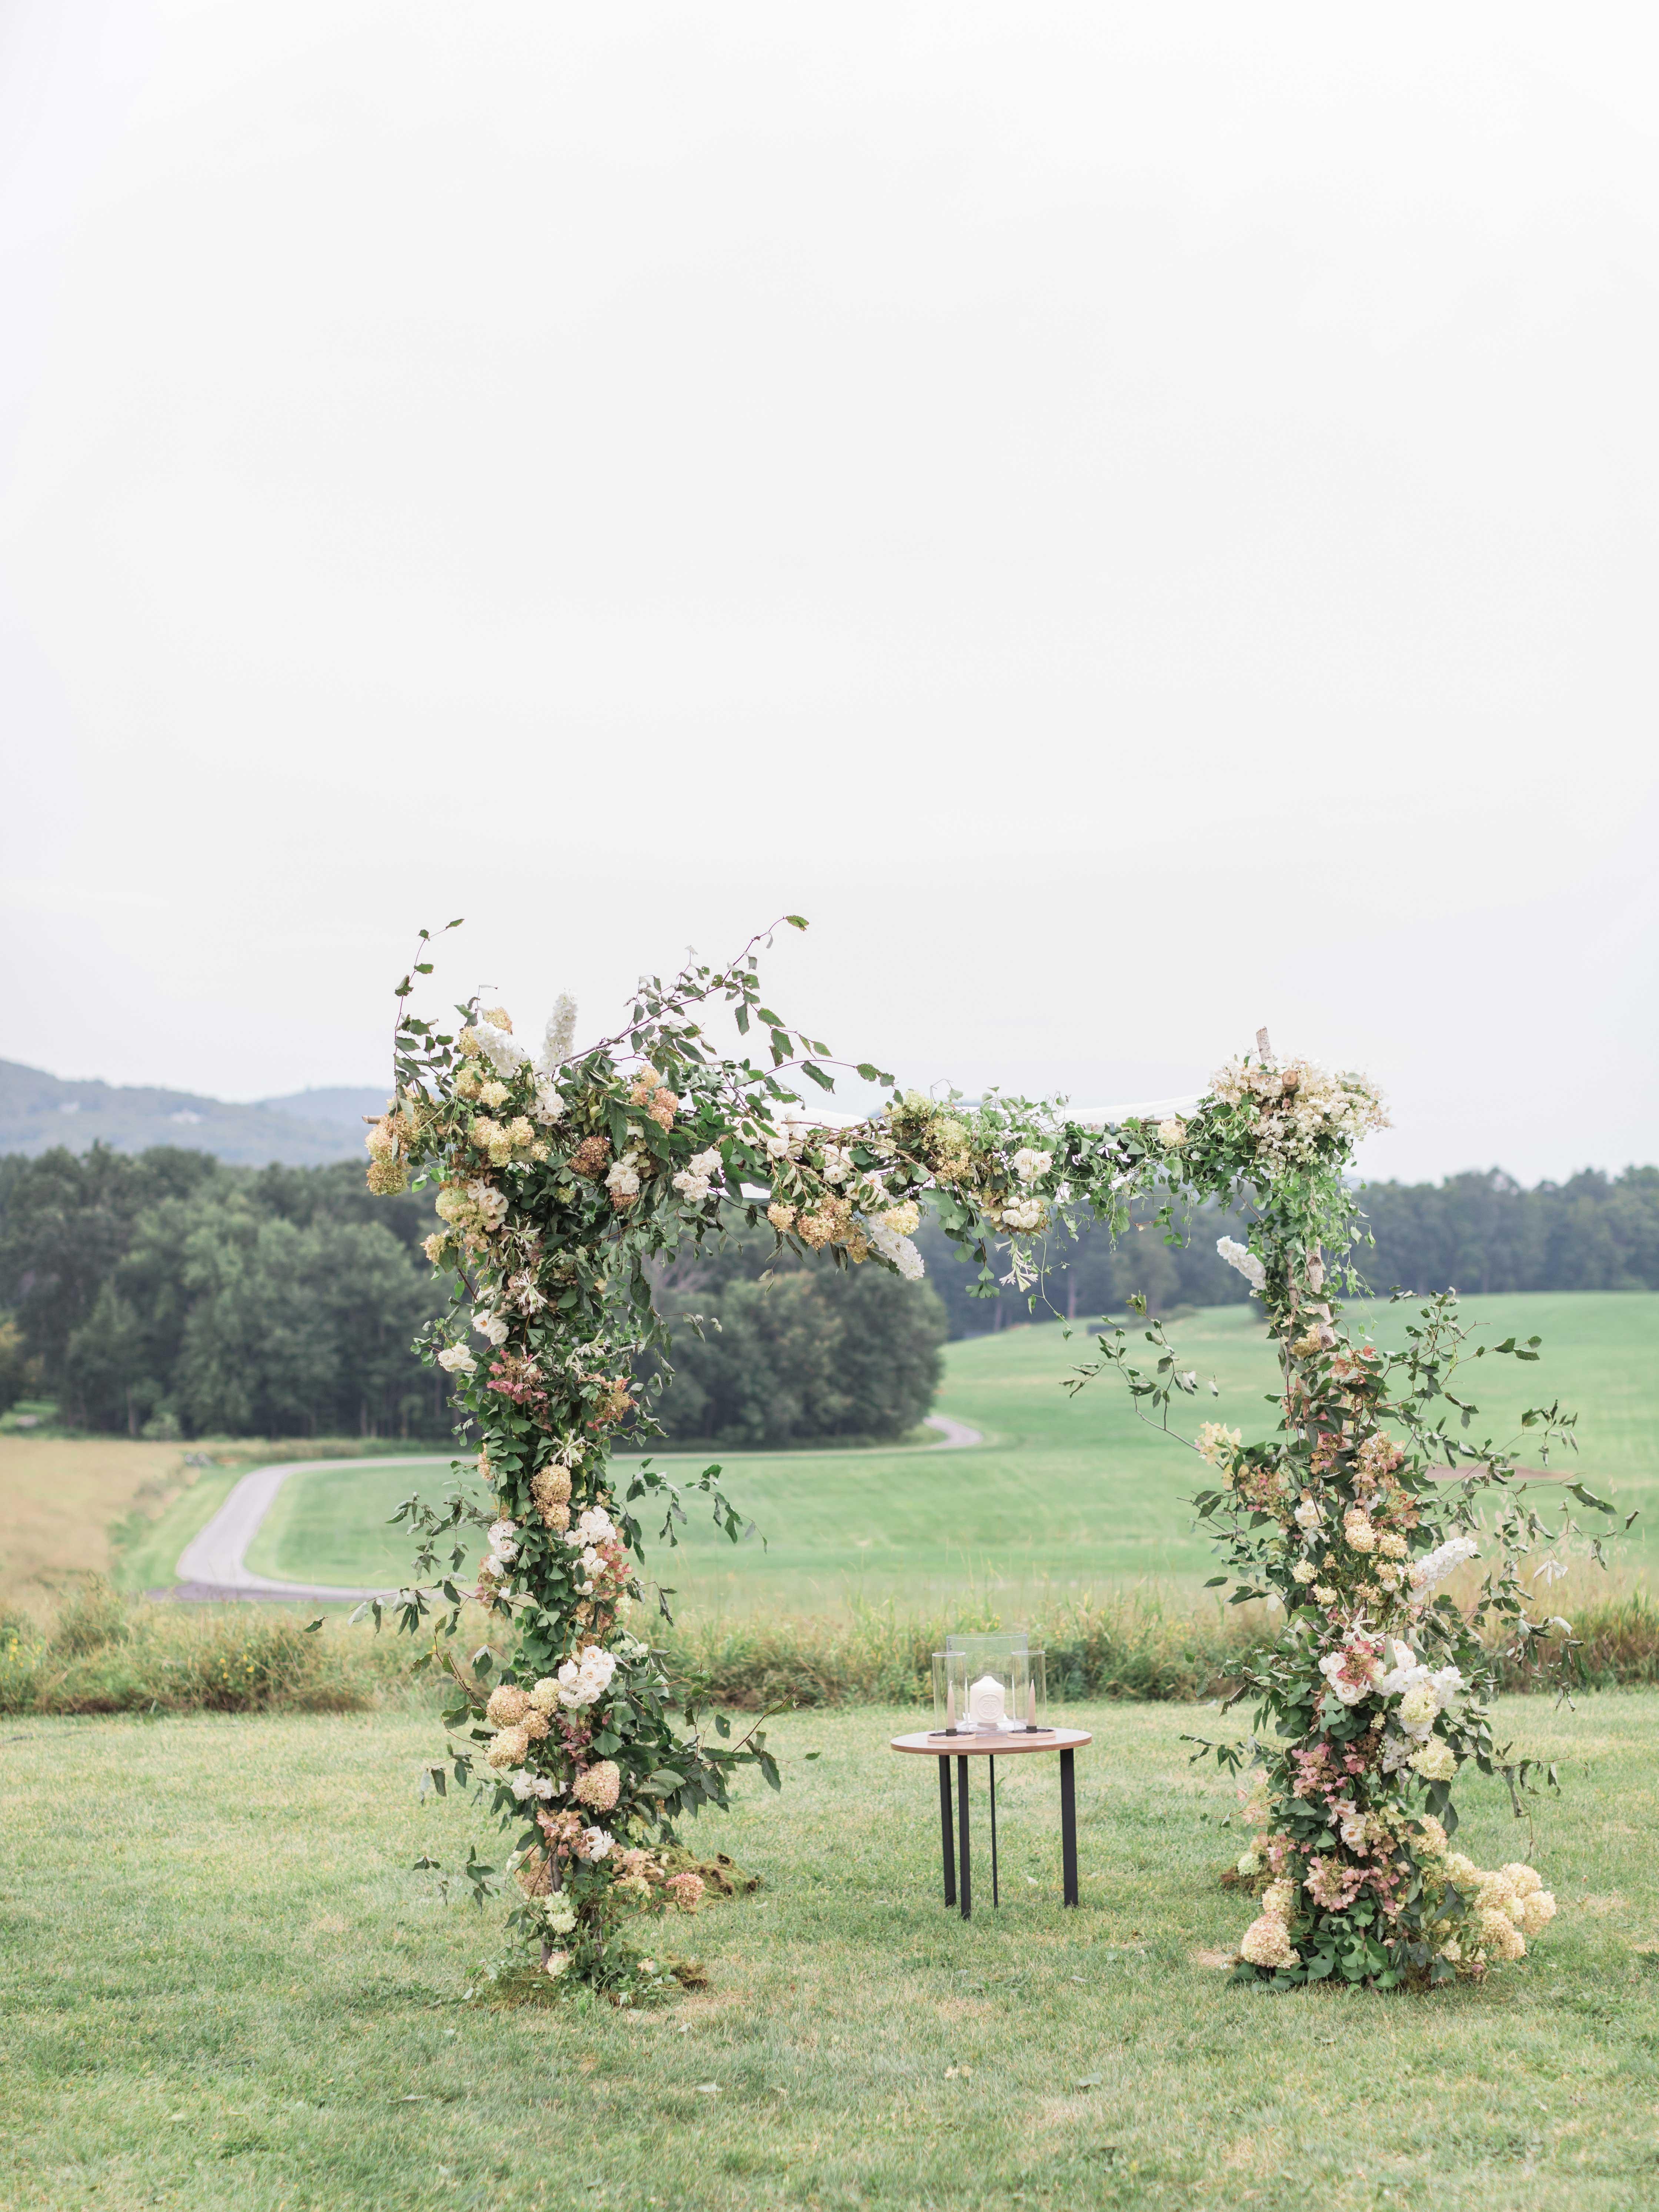 ashley samantha wedding cornwall ny ceremony arch